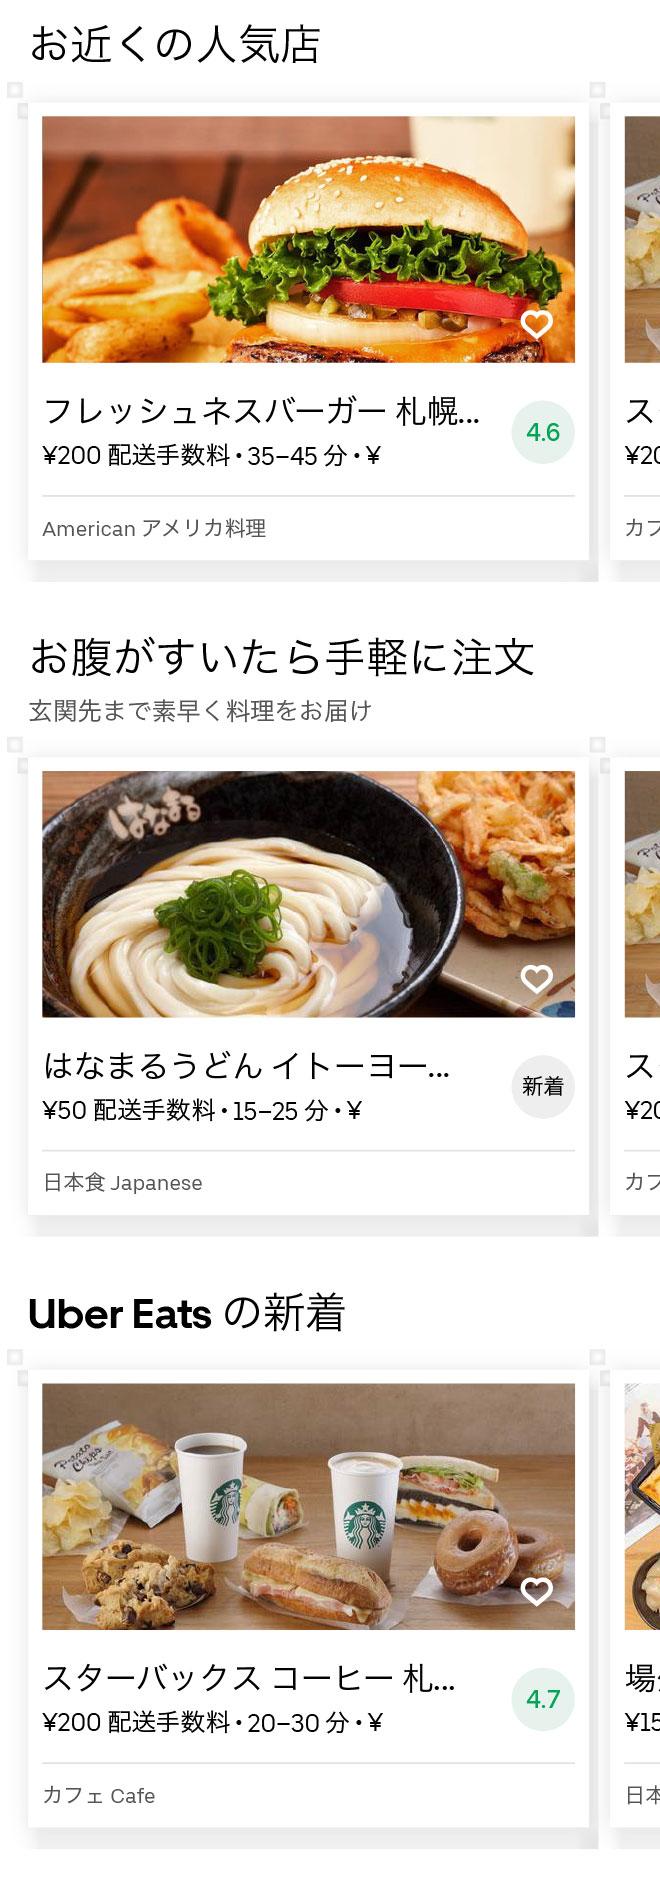 Kotoni jr menu 2008 01